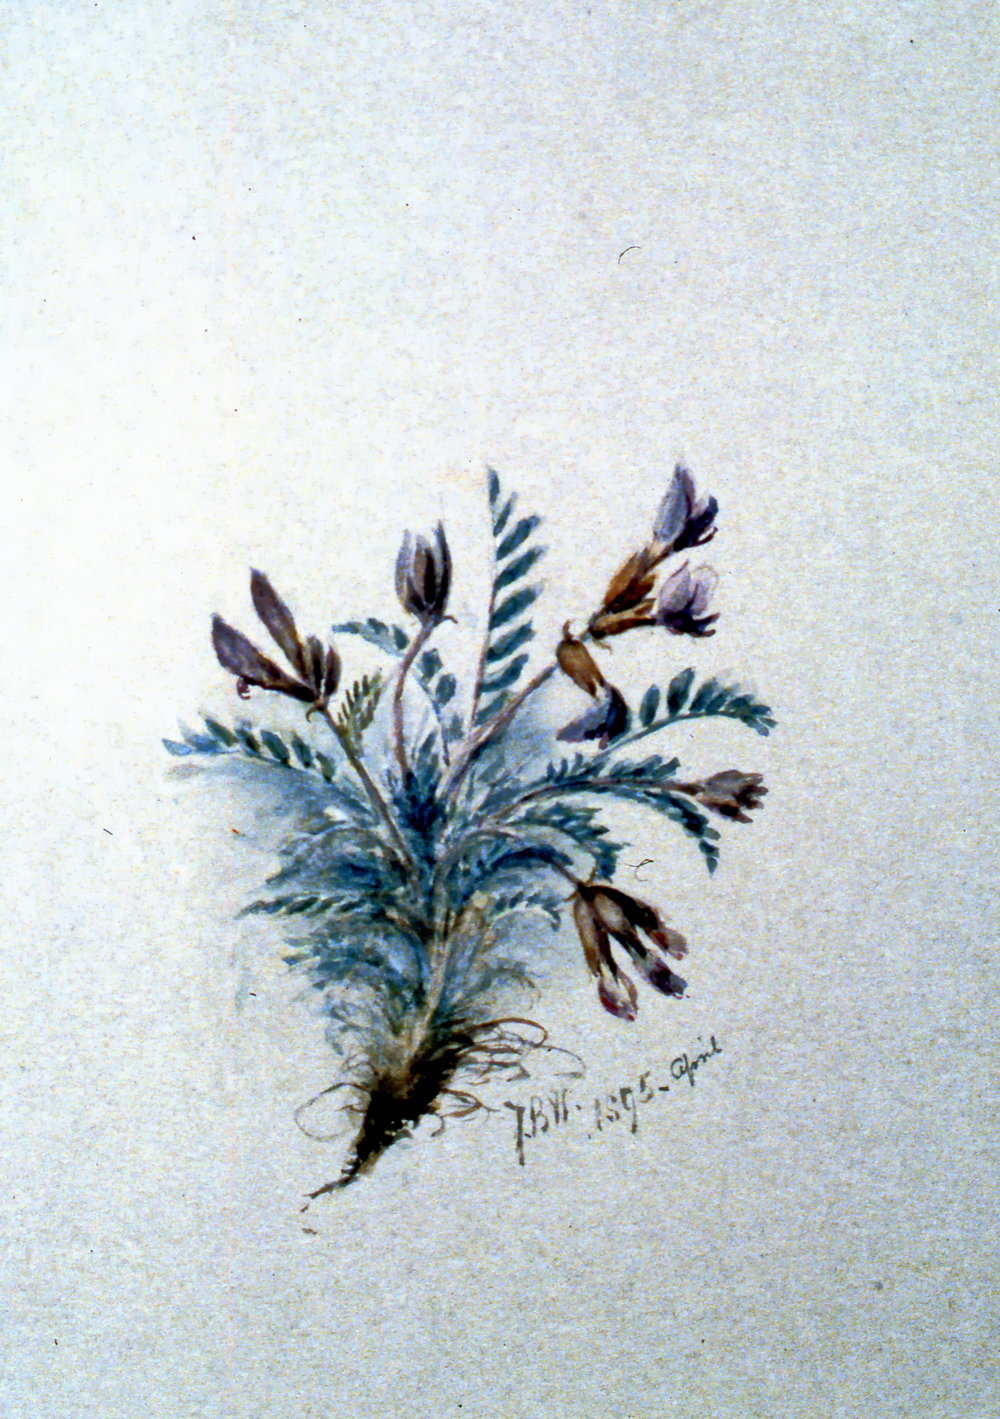 Untitled (Purple Flowers), Julia Bullock-Webster1895, watercolour on paper, 25.5 x 35.5 cm, 1983.02.20. Gift of Mrs. Barbara Steel.